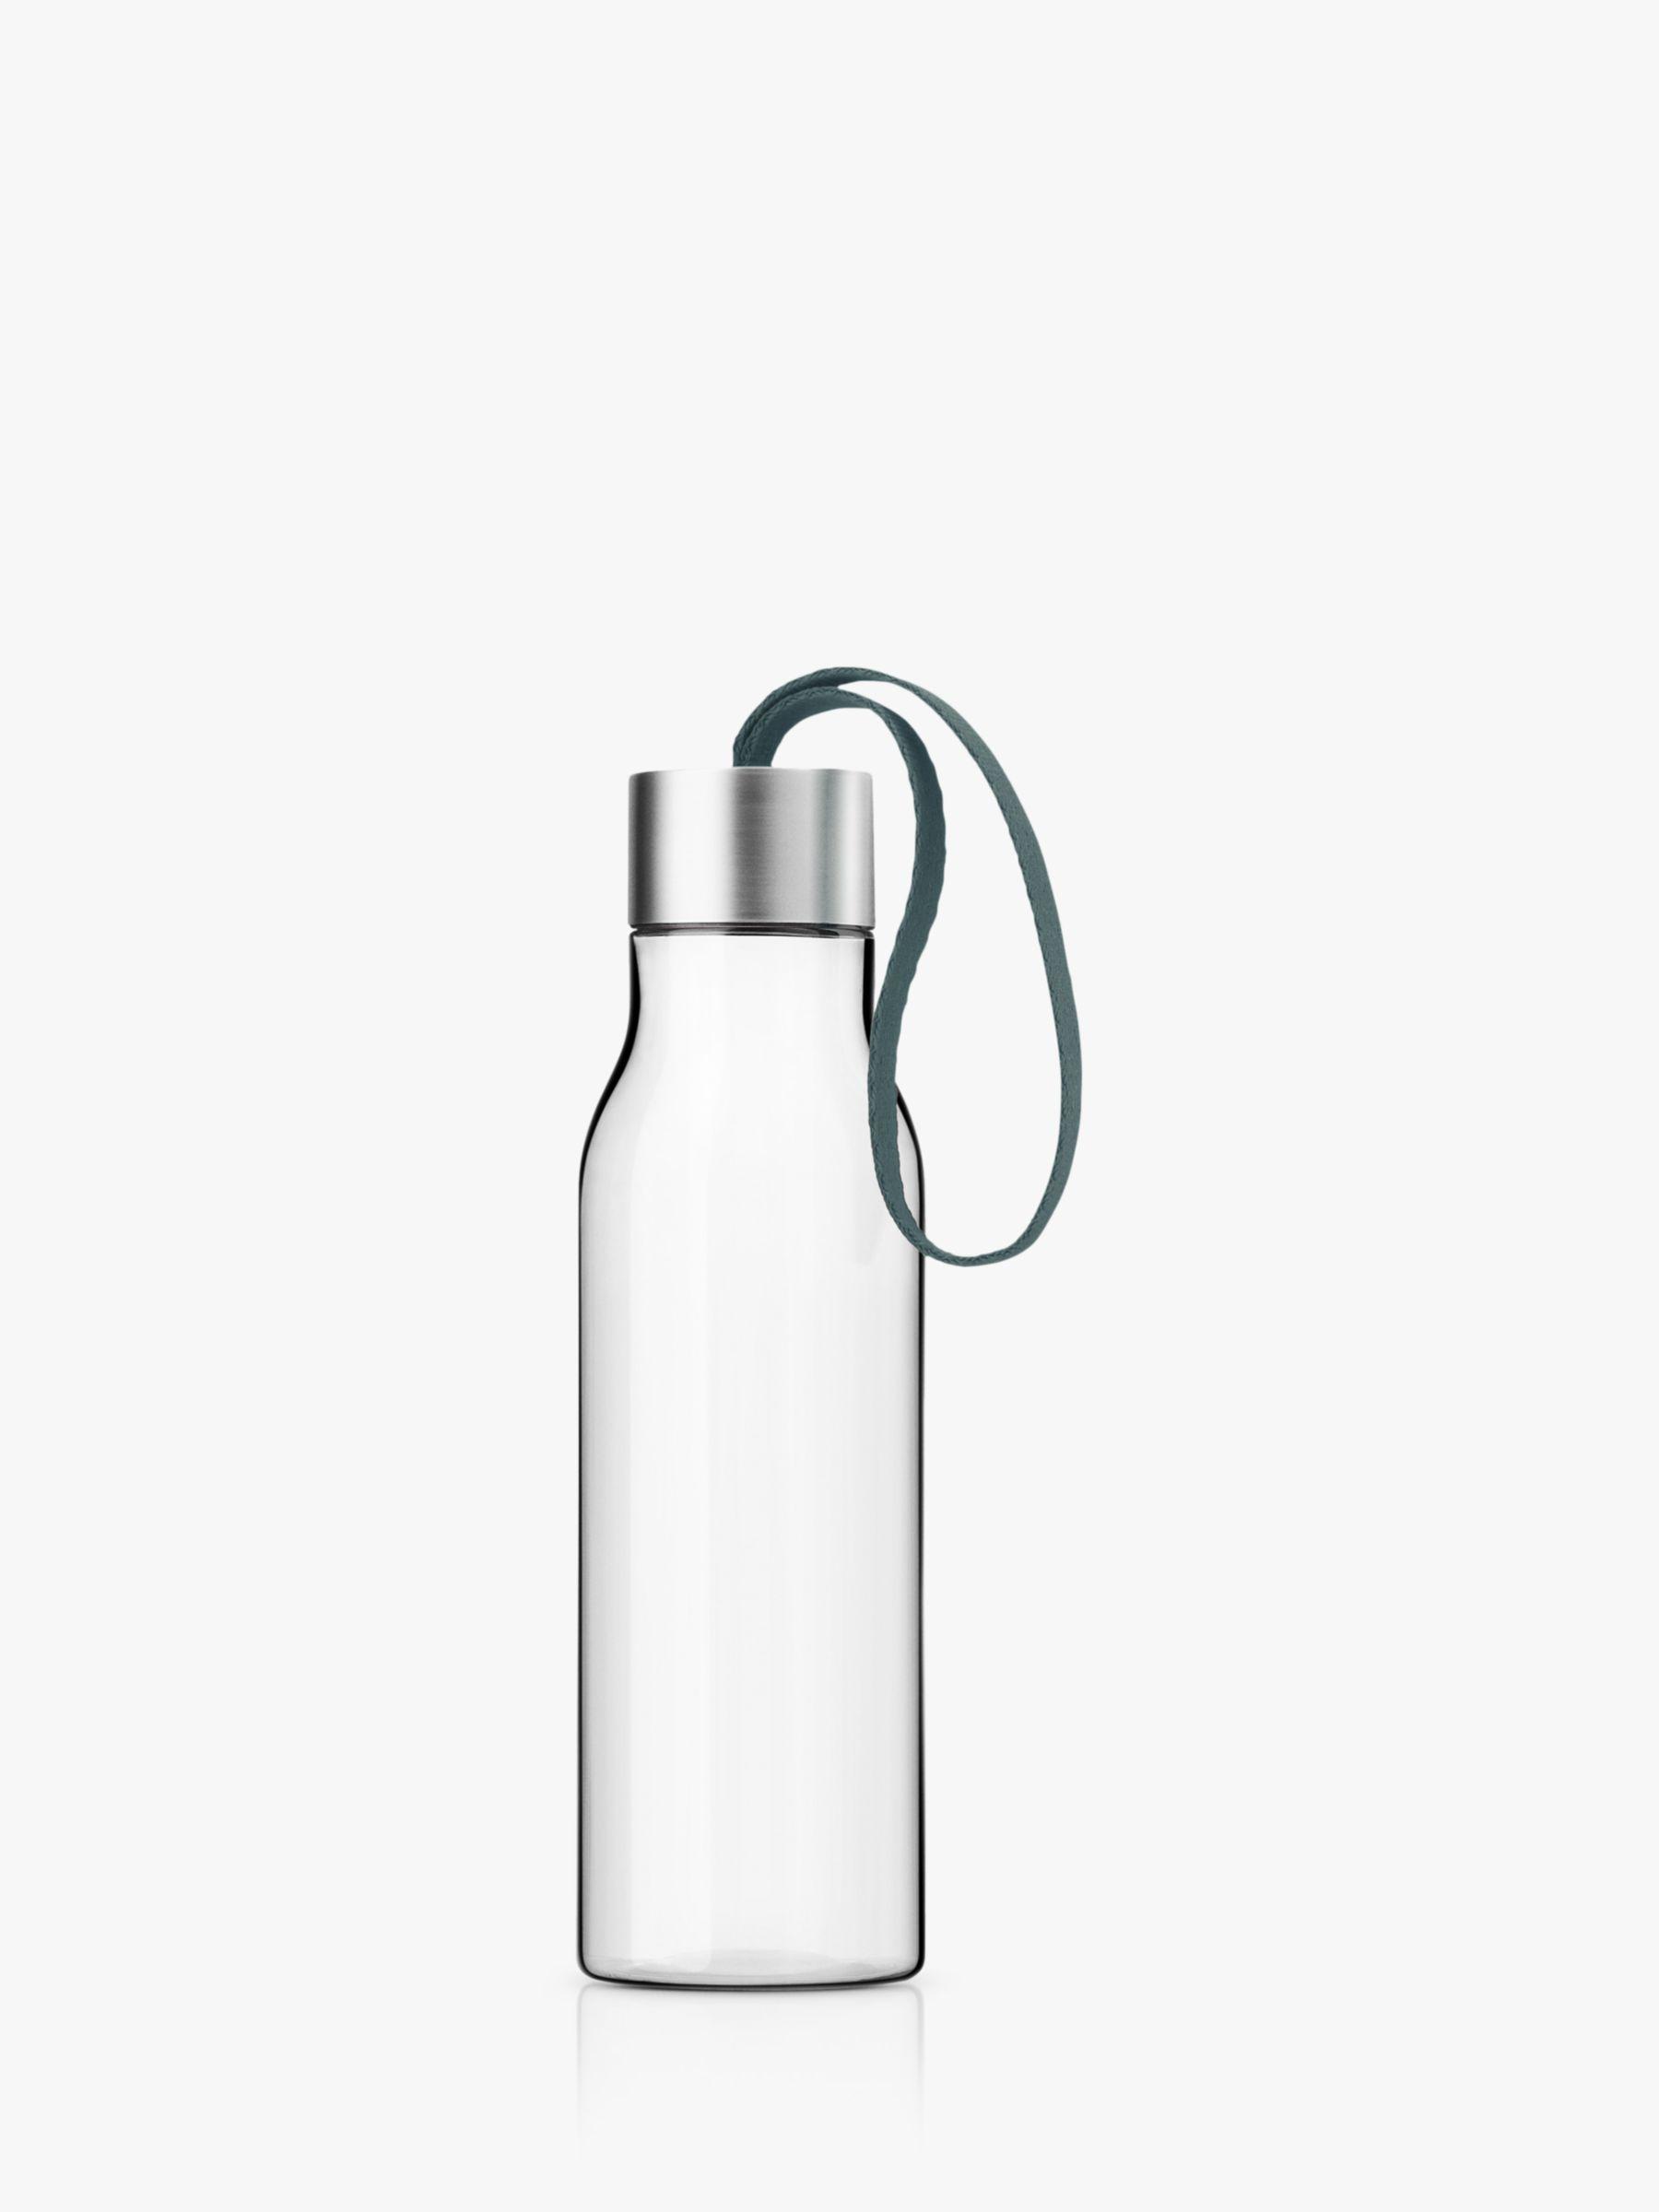 Eva Solo Eva Solo 'To Go' Drinks Bottle, 500ml, Petrol